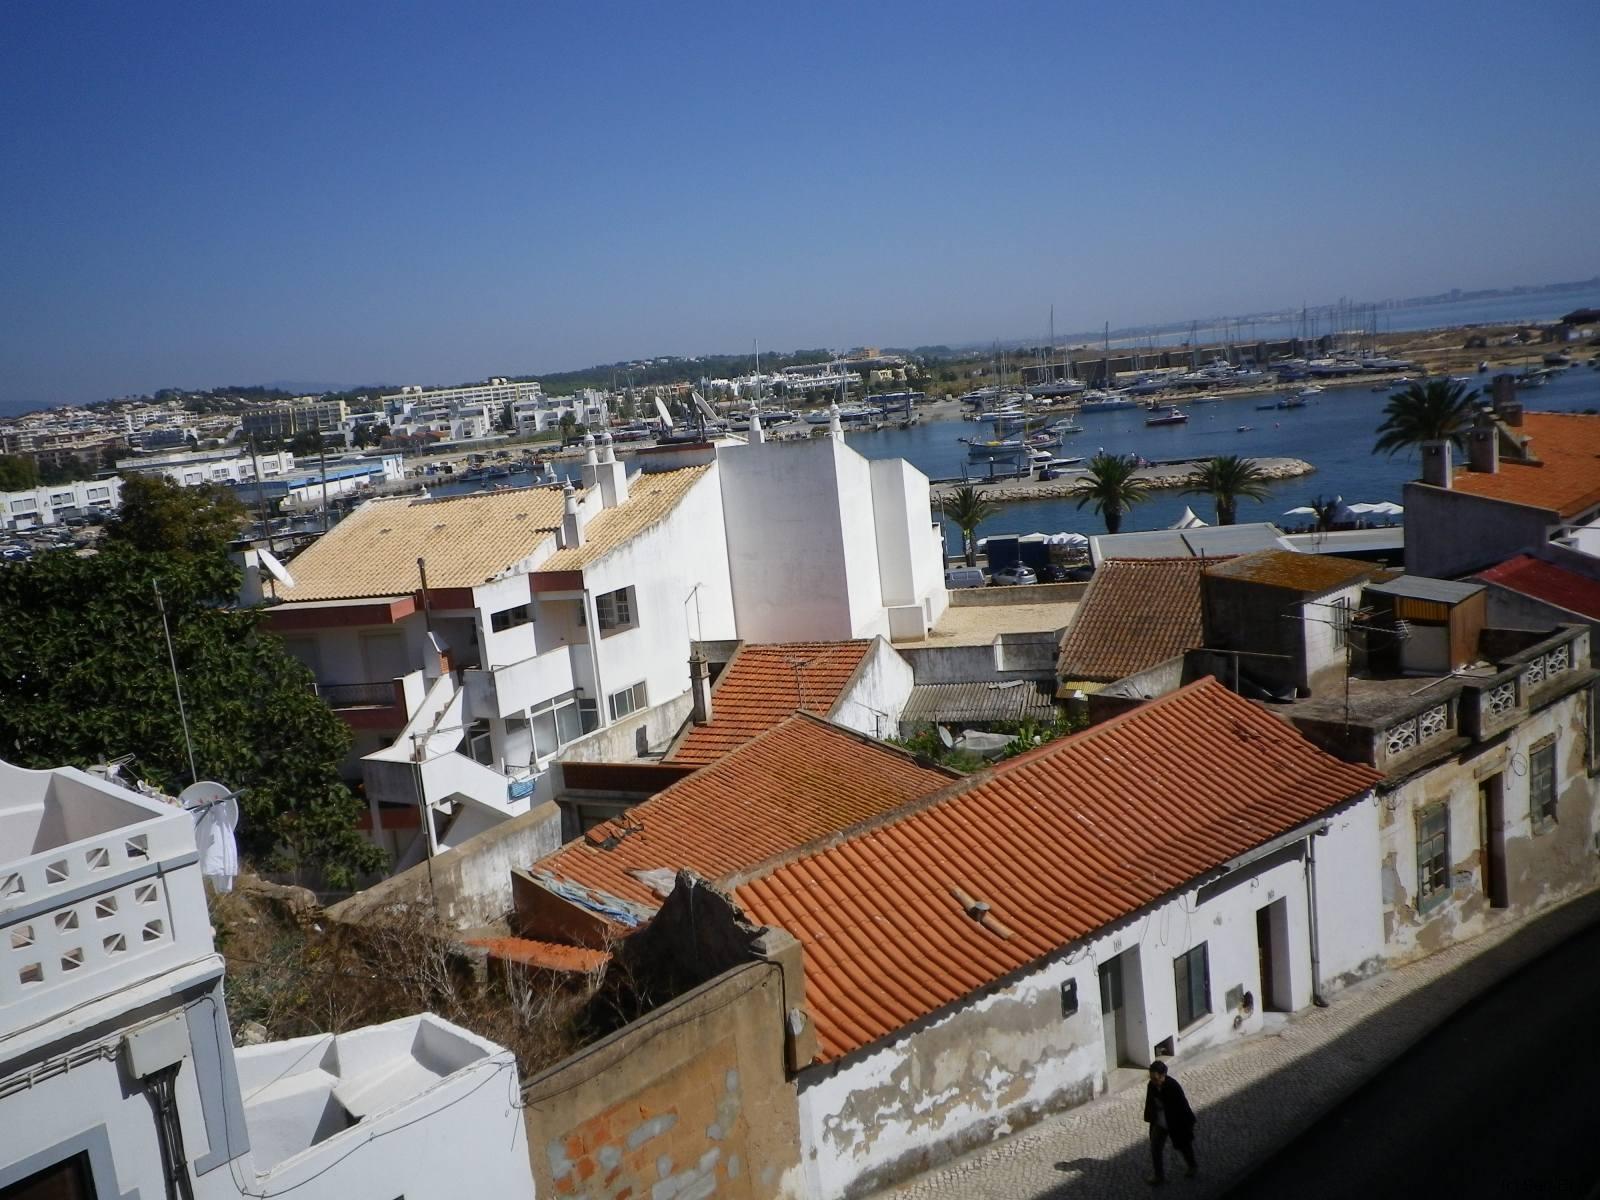 Algarve-673-IMGP5233